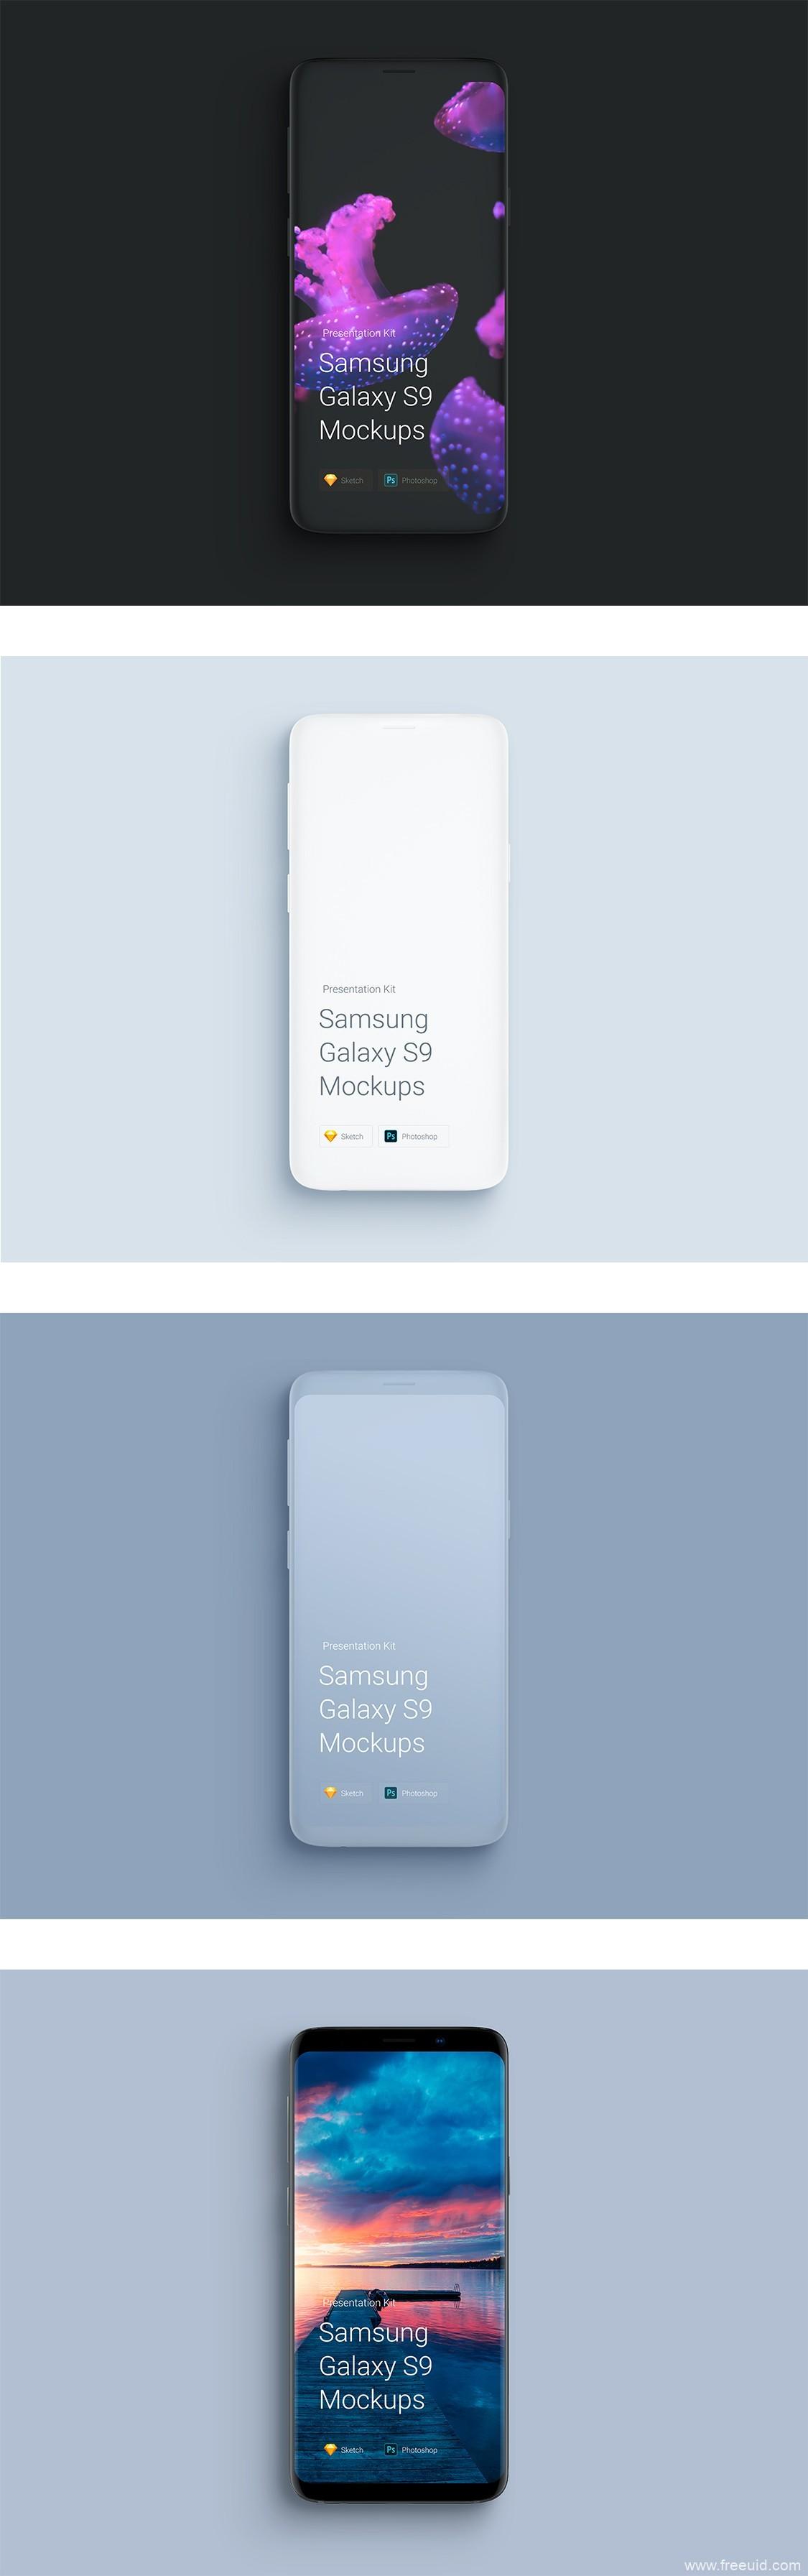 samsung-galaxy-s9-mockup手机展示样机psd、sketch模板源文件下载